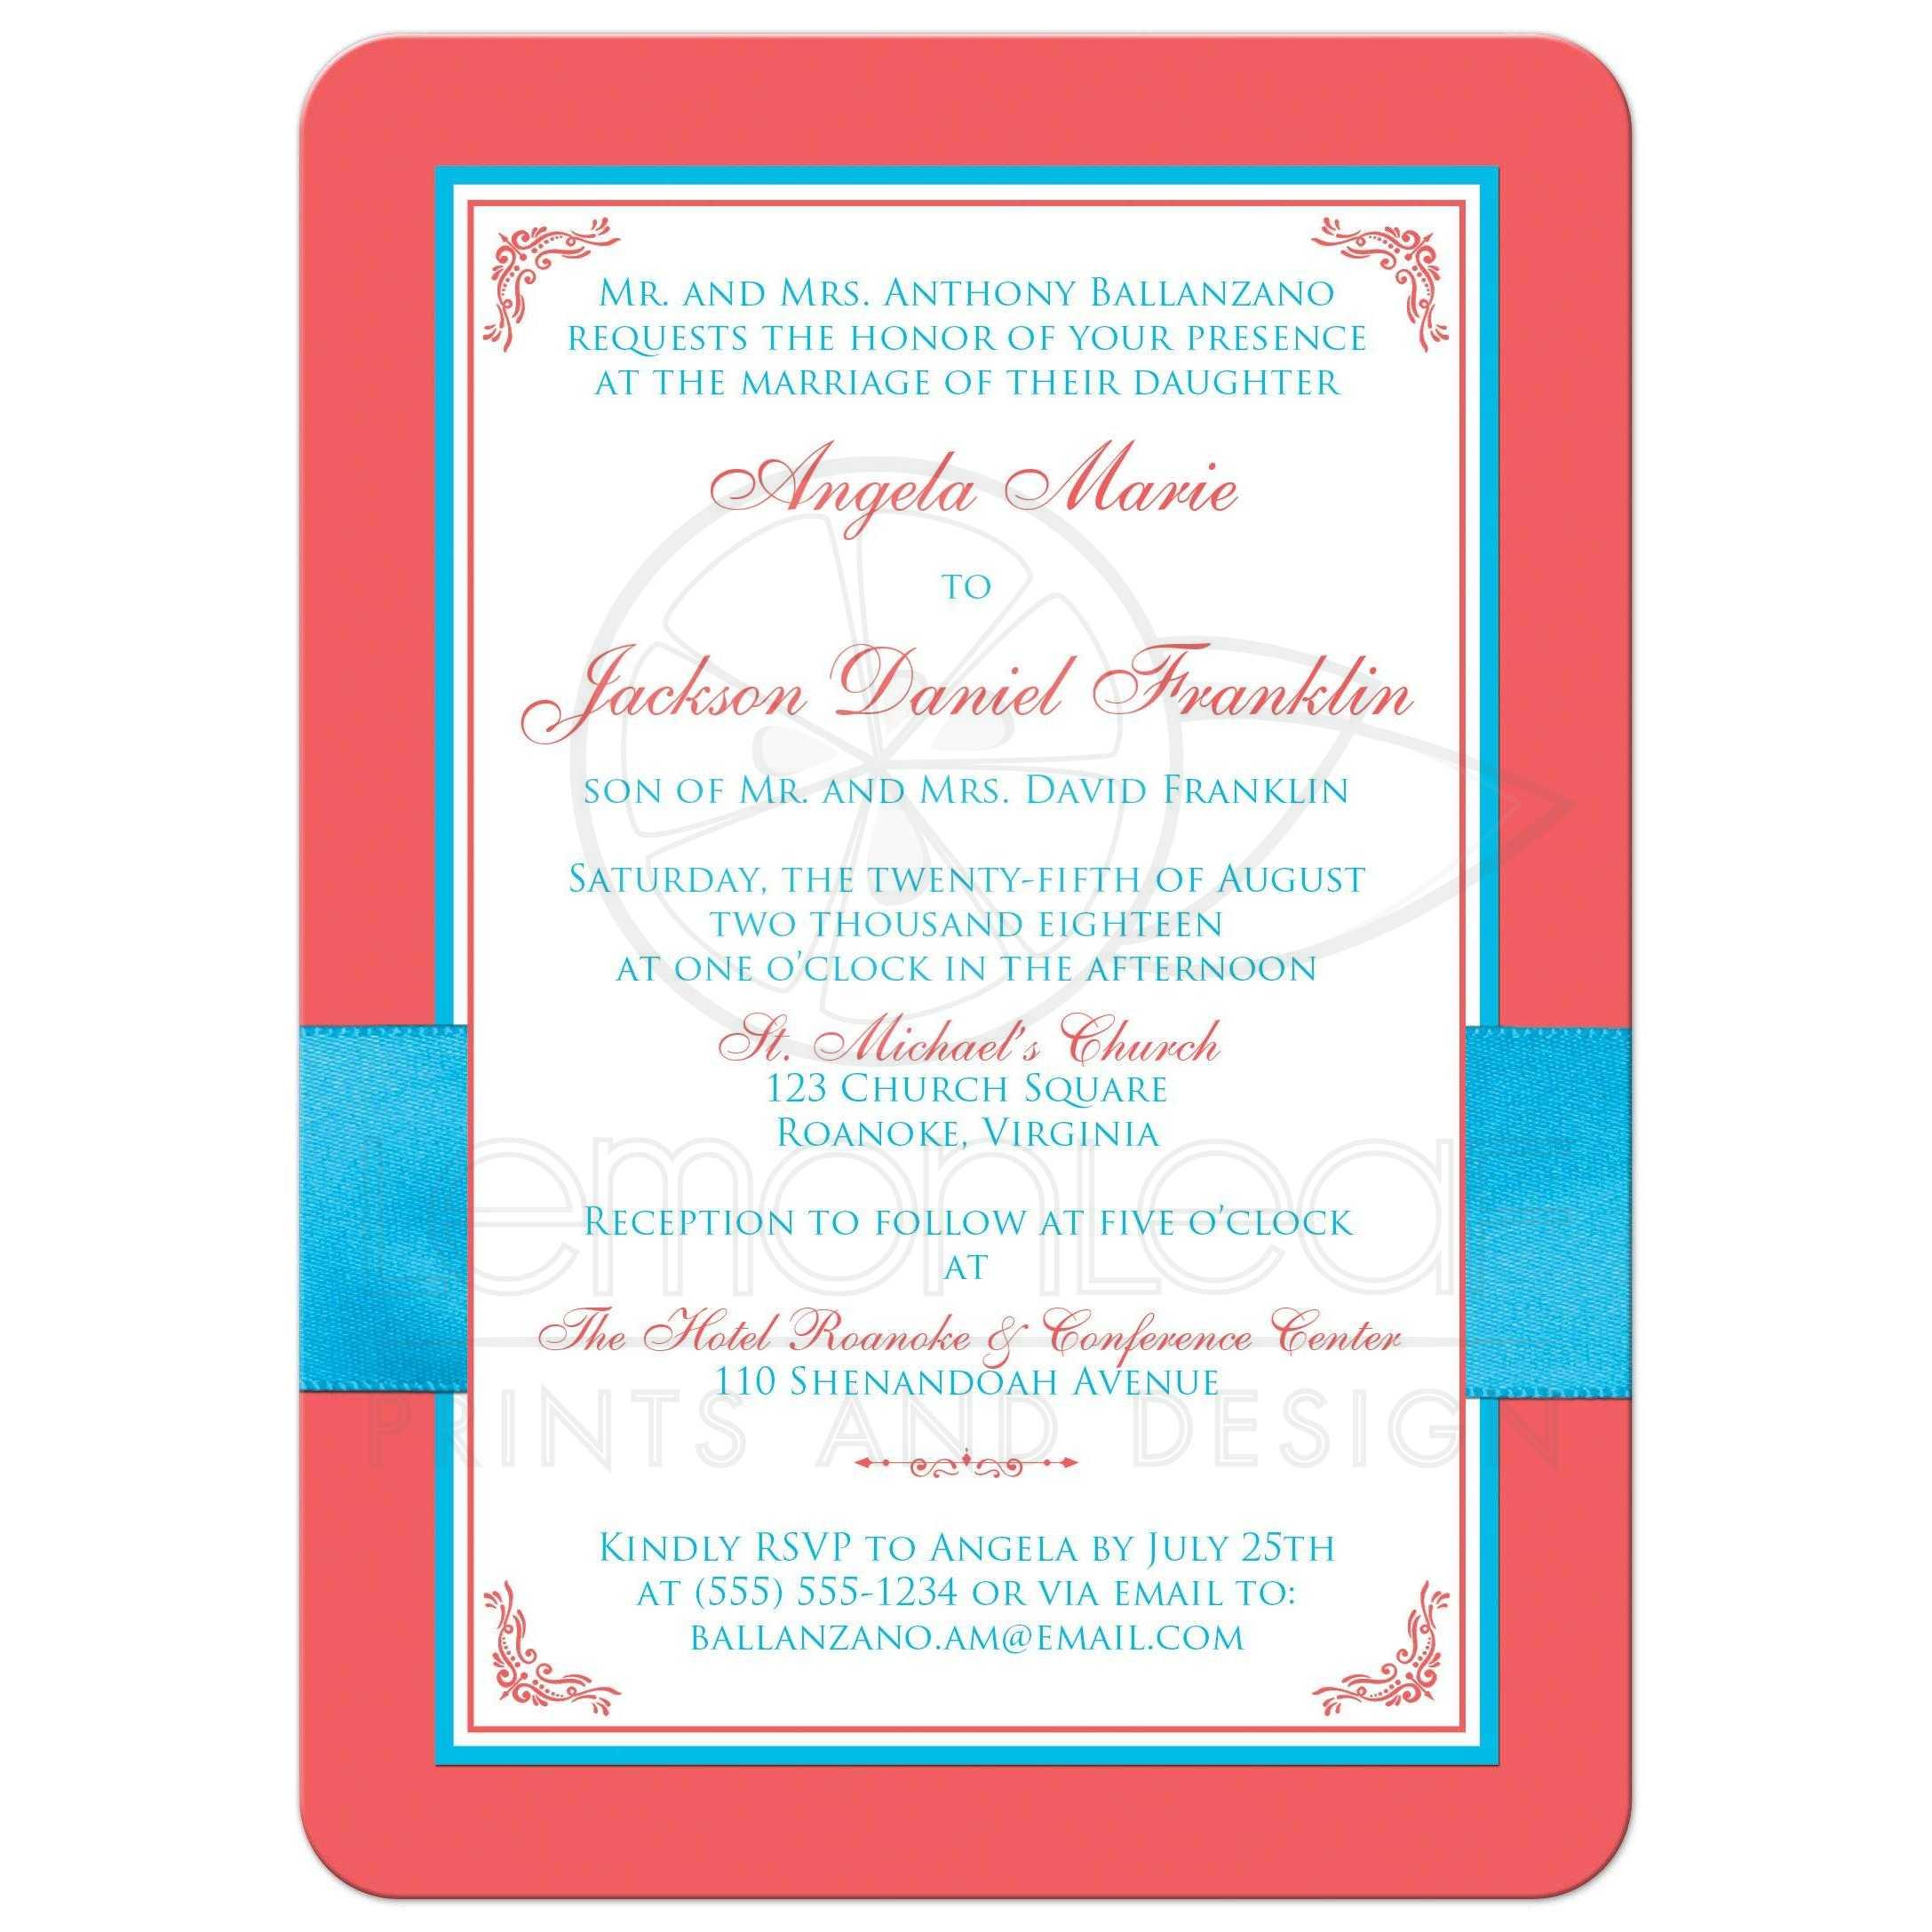 Malibu Blue, Coral, and White Floral Wedding Invitation | PRINTED ...